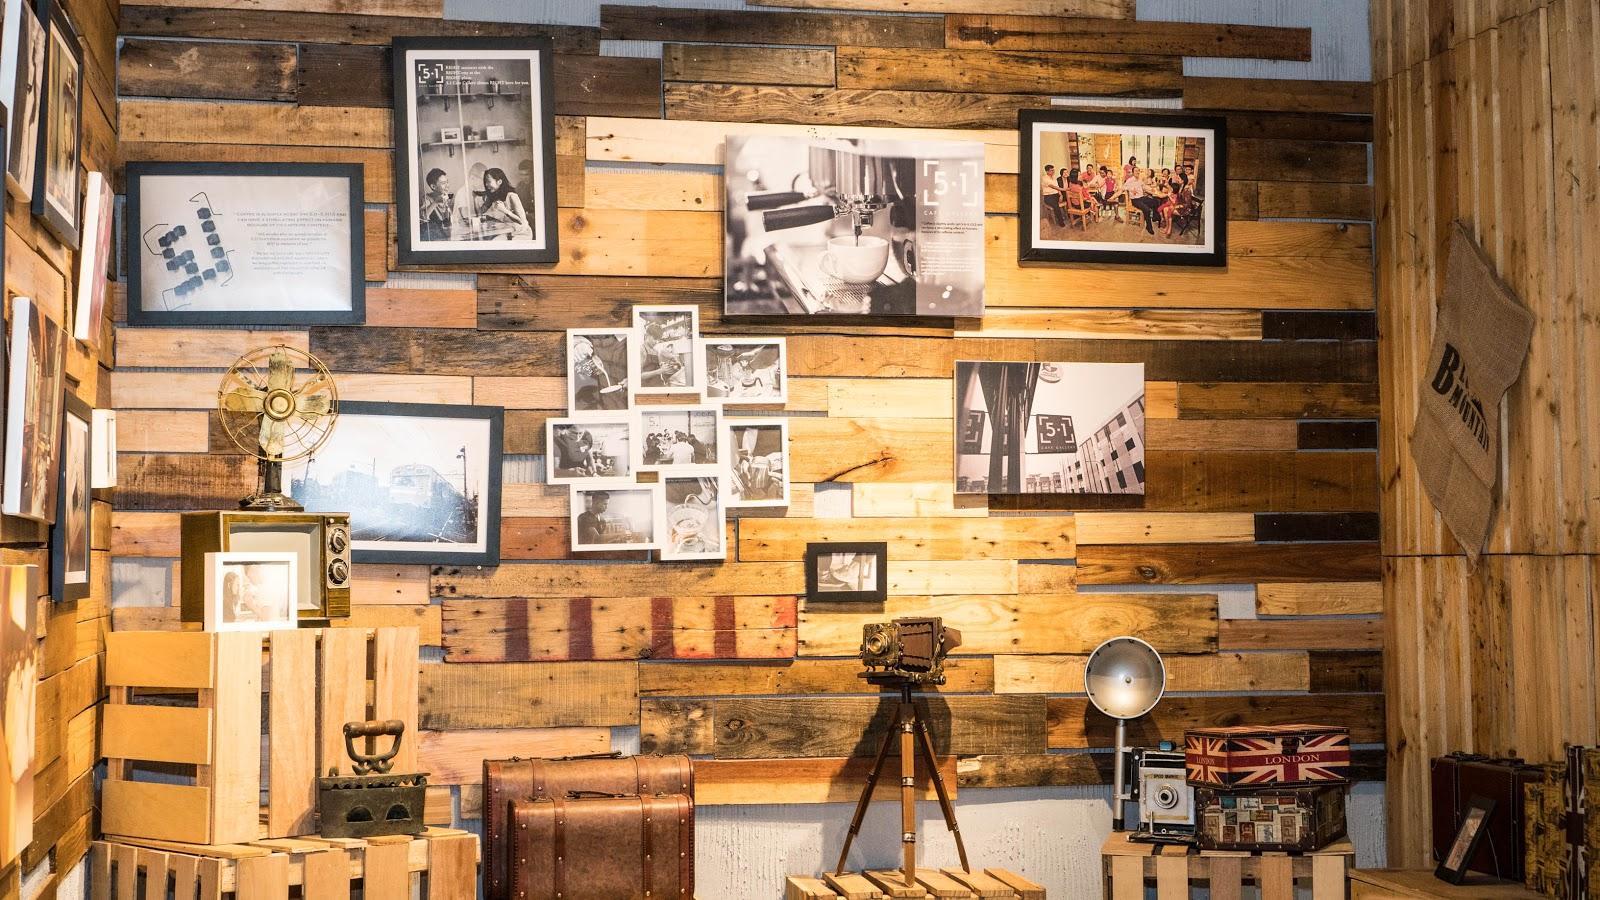 5 1 Cafe Gallery, Sri Petaling